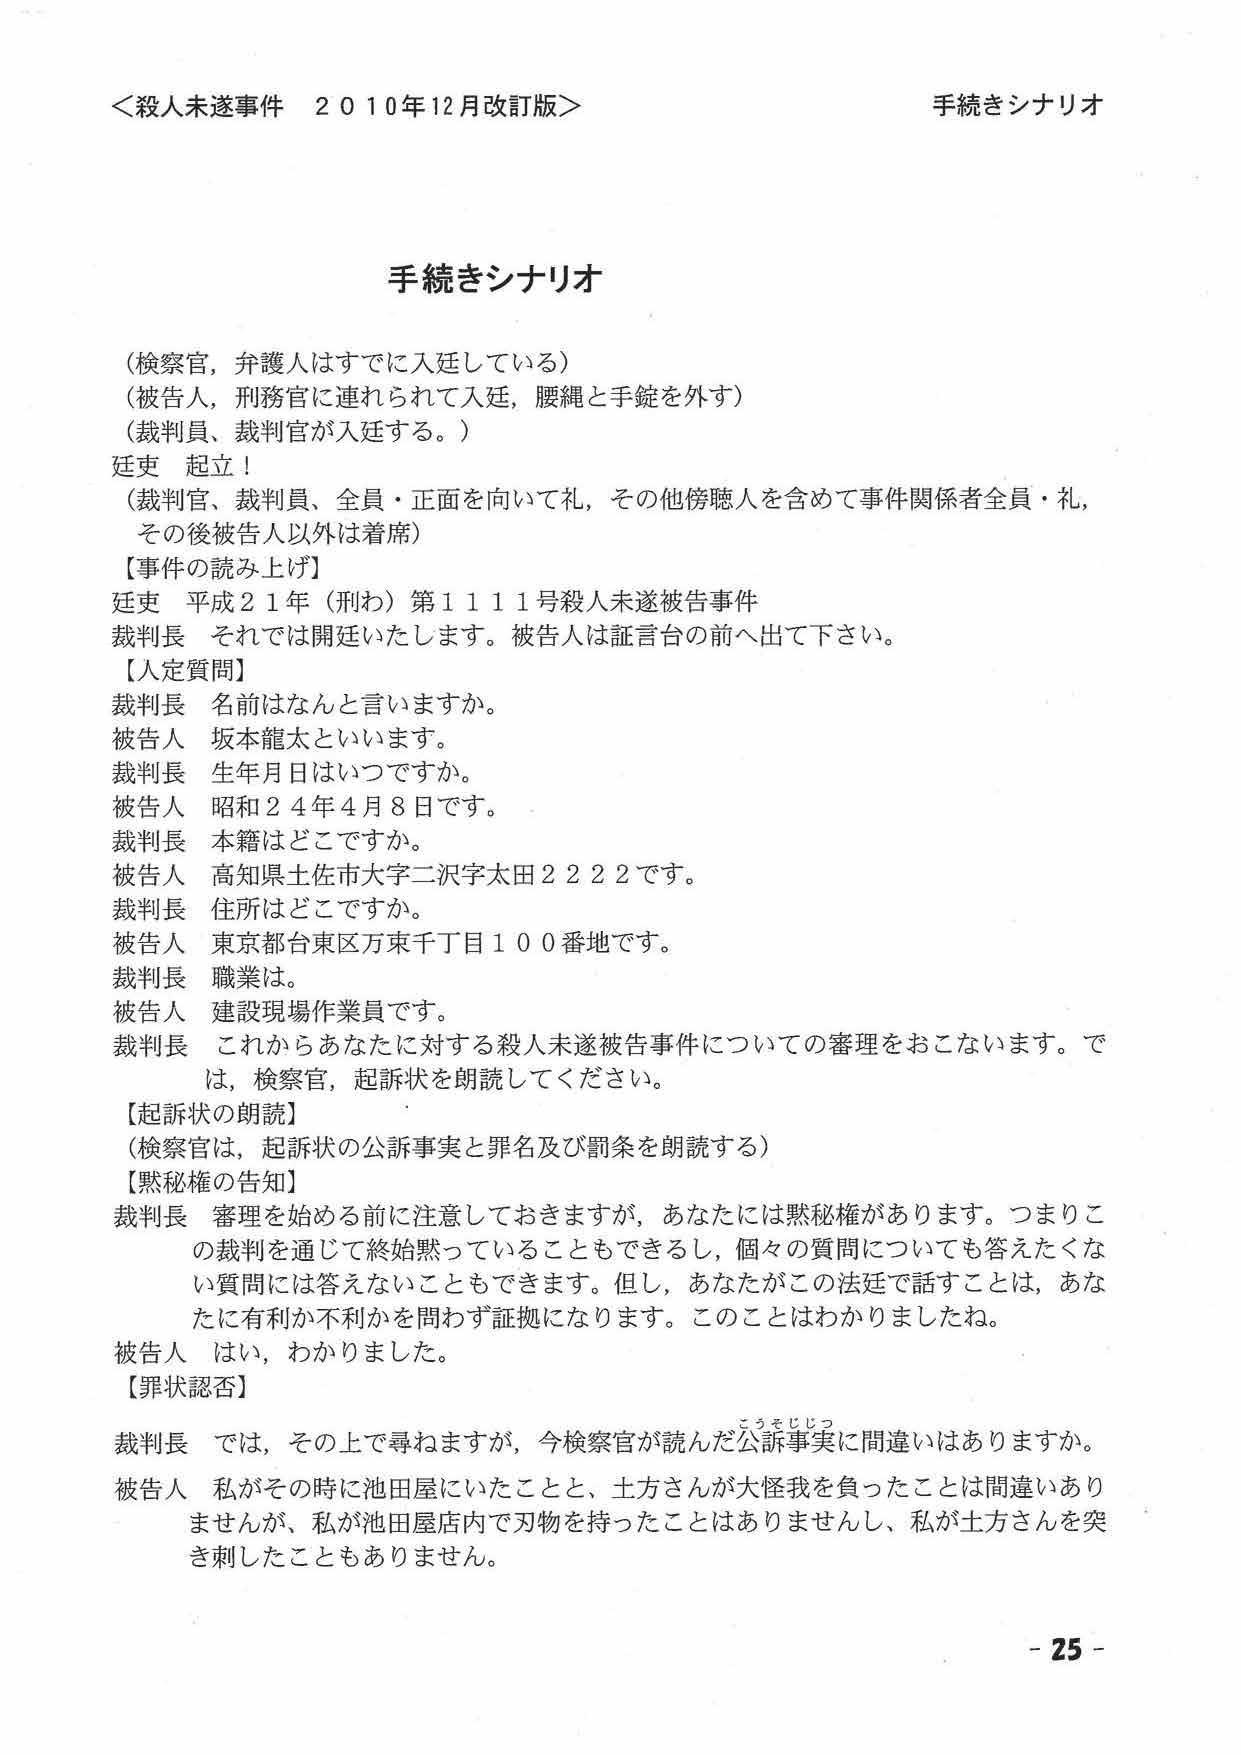 satsujin2-3.jpg